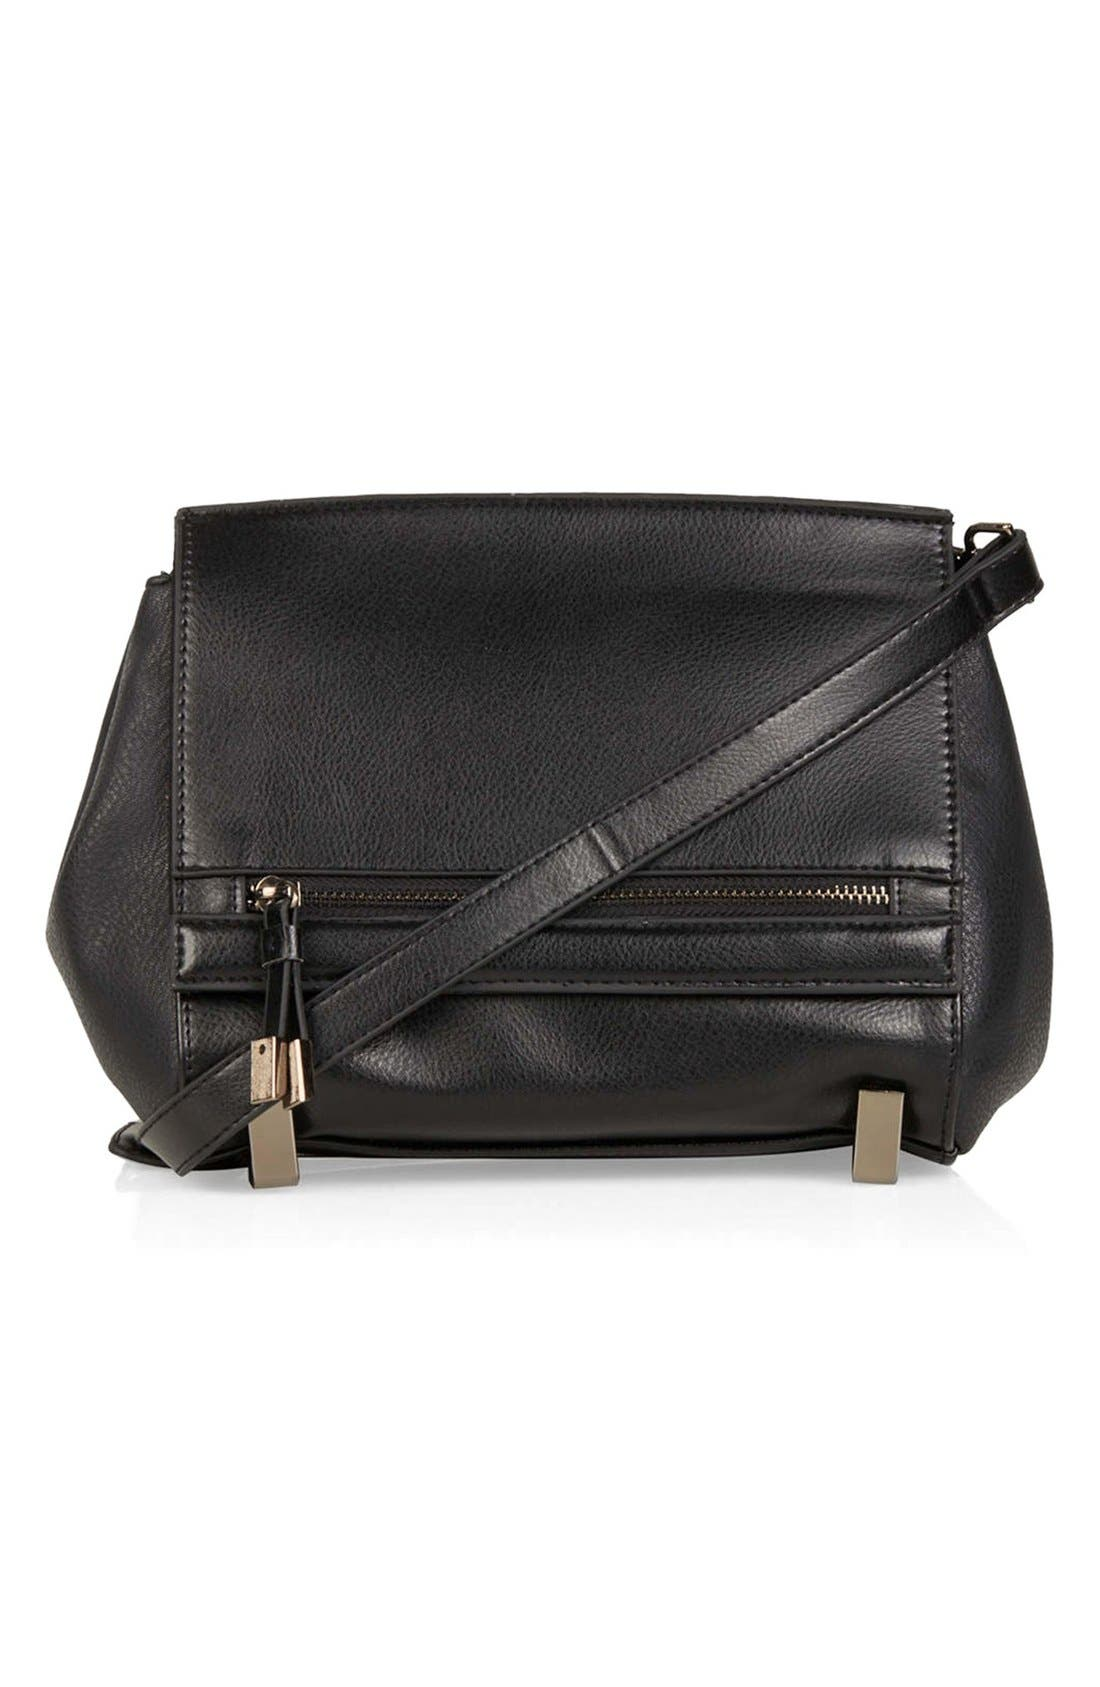 Alternate Image 1 Selected - Topshop Crossbody Bag